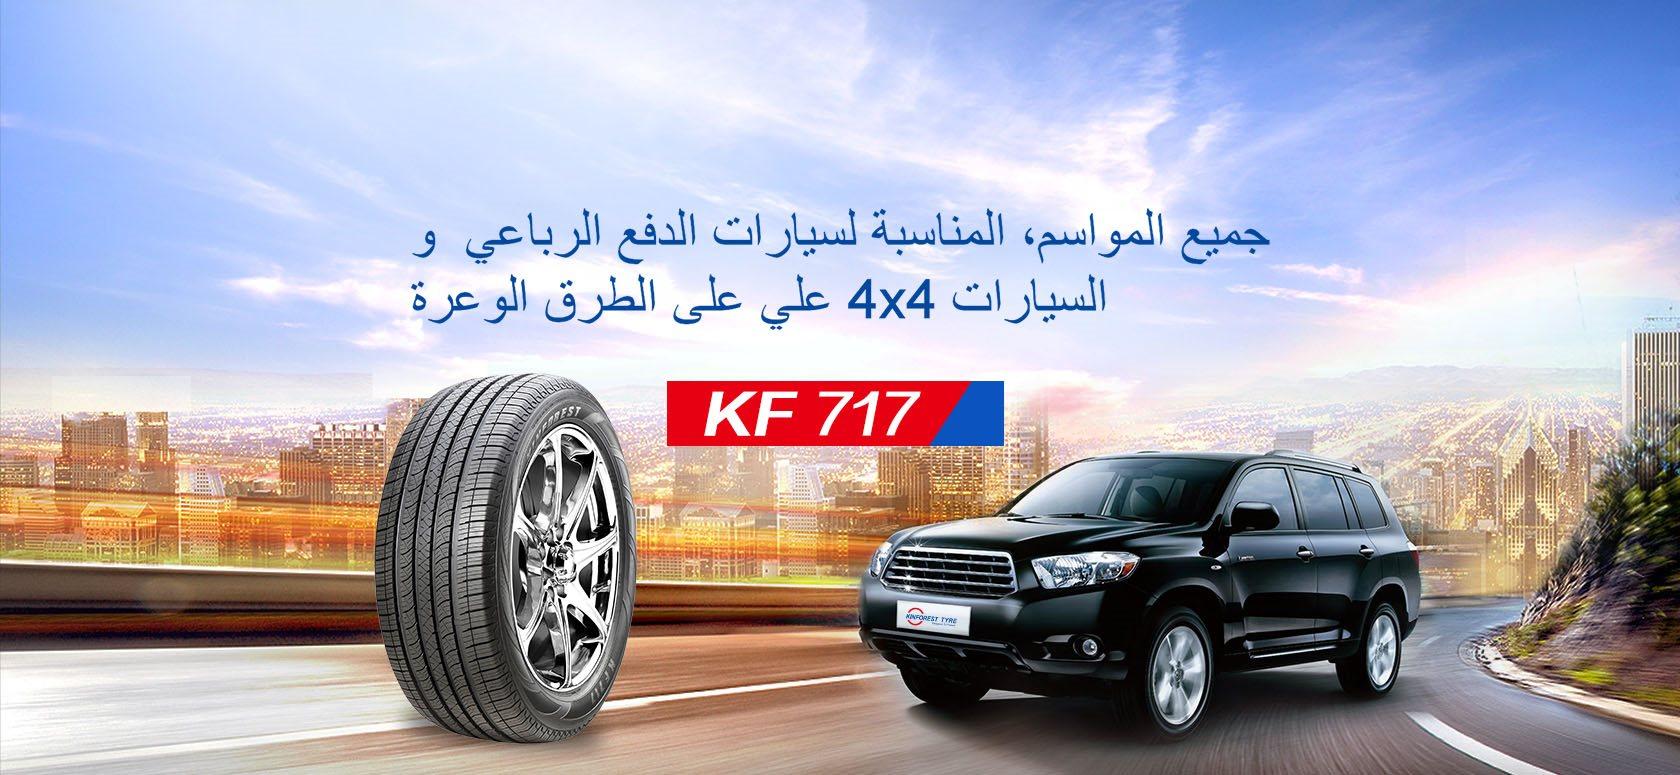 KF717